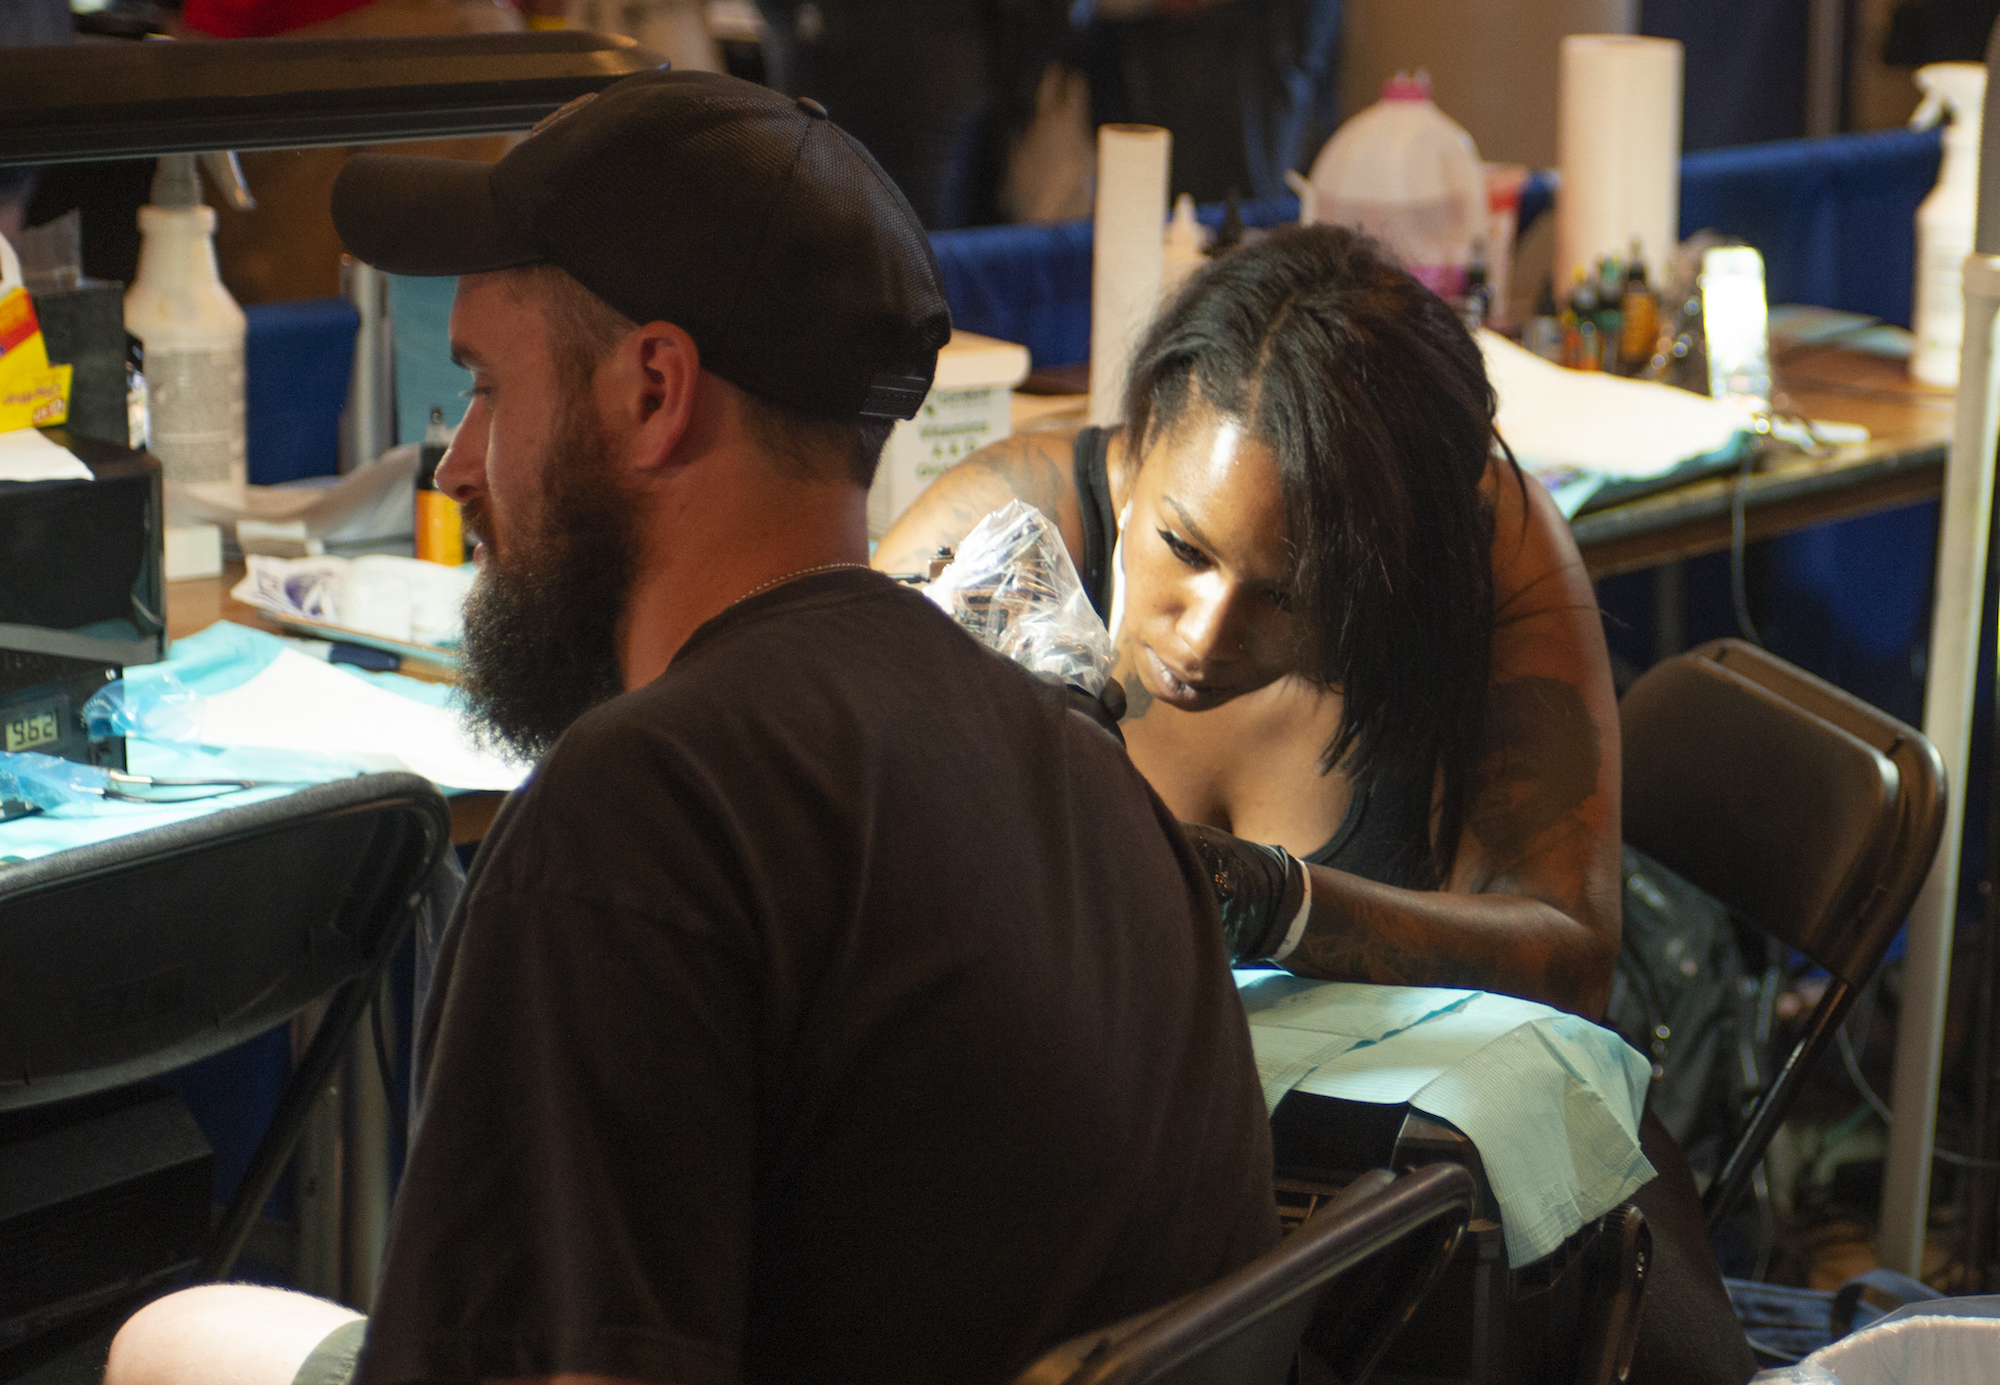 Tattoos-5259.jpg